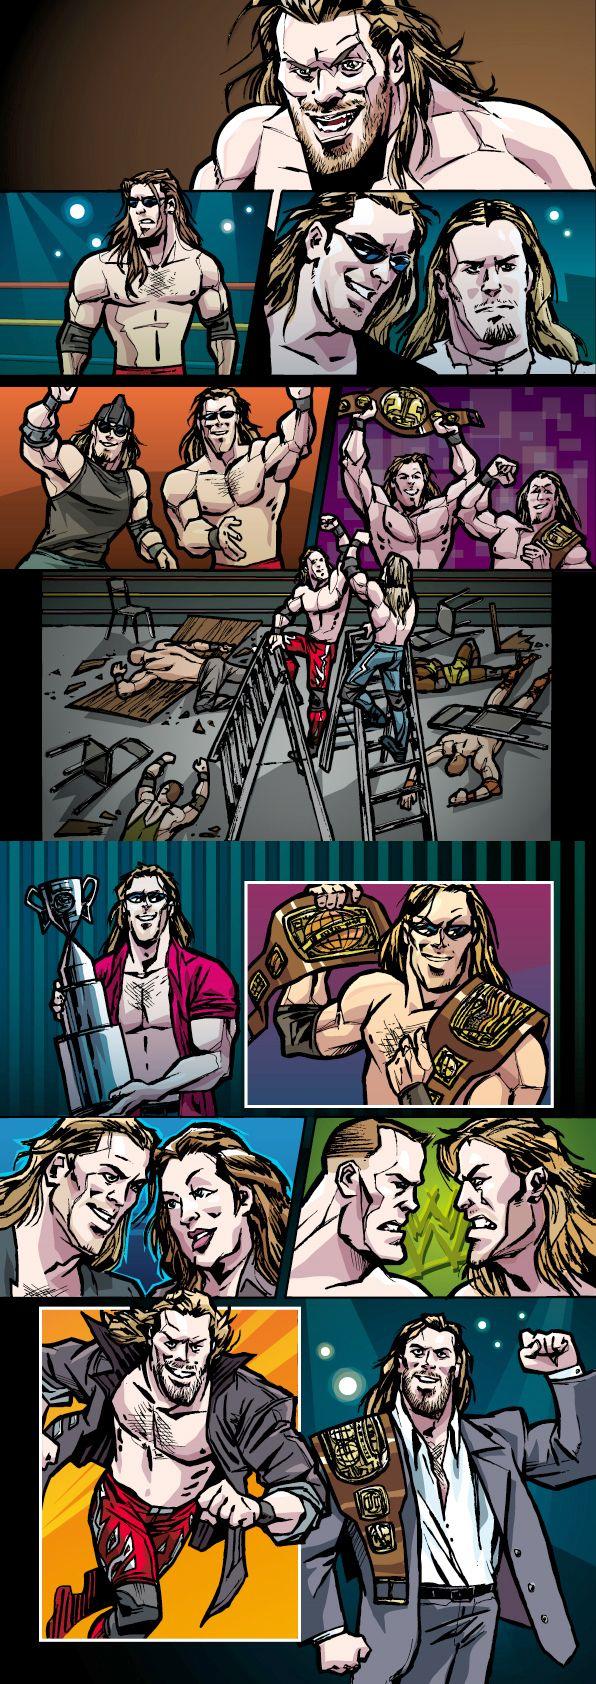 The Edge mini comic tribute #wwe